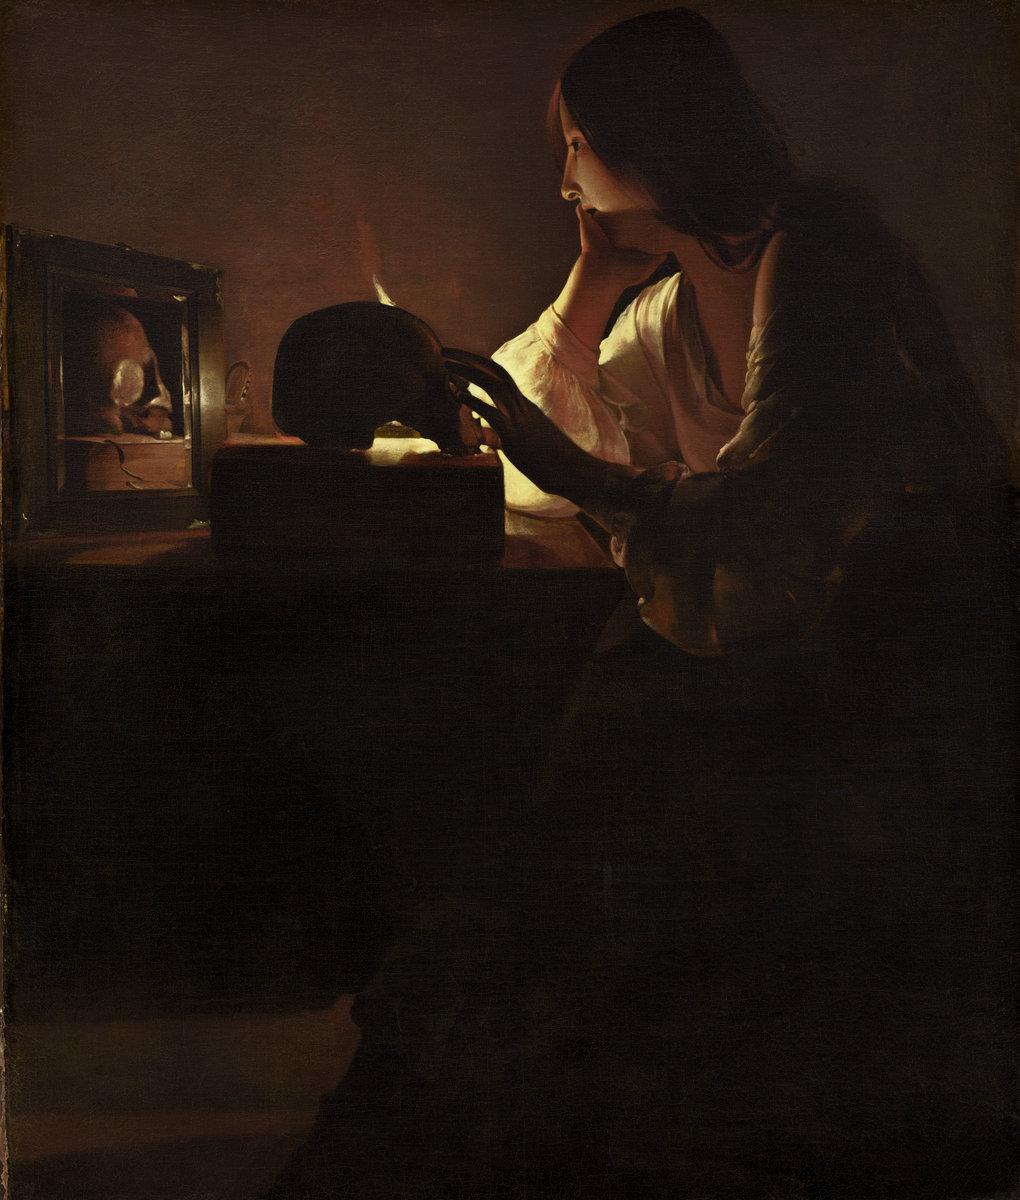 Georges de La Tour (French, 1593 - 1652 ), The Repentant Magdalen, c. 1635/1640, oil on canvas. Washington, National Gallery, Ailsa Mellon Bruce Fund